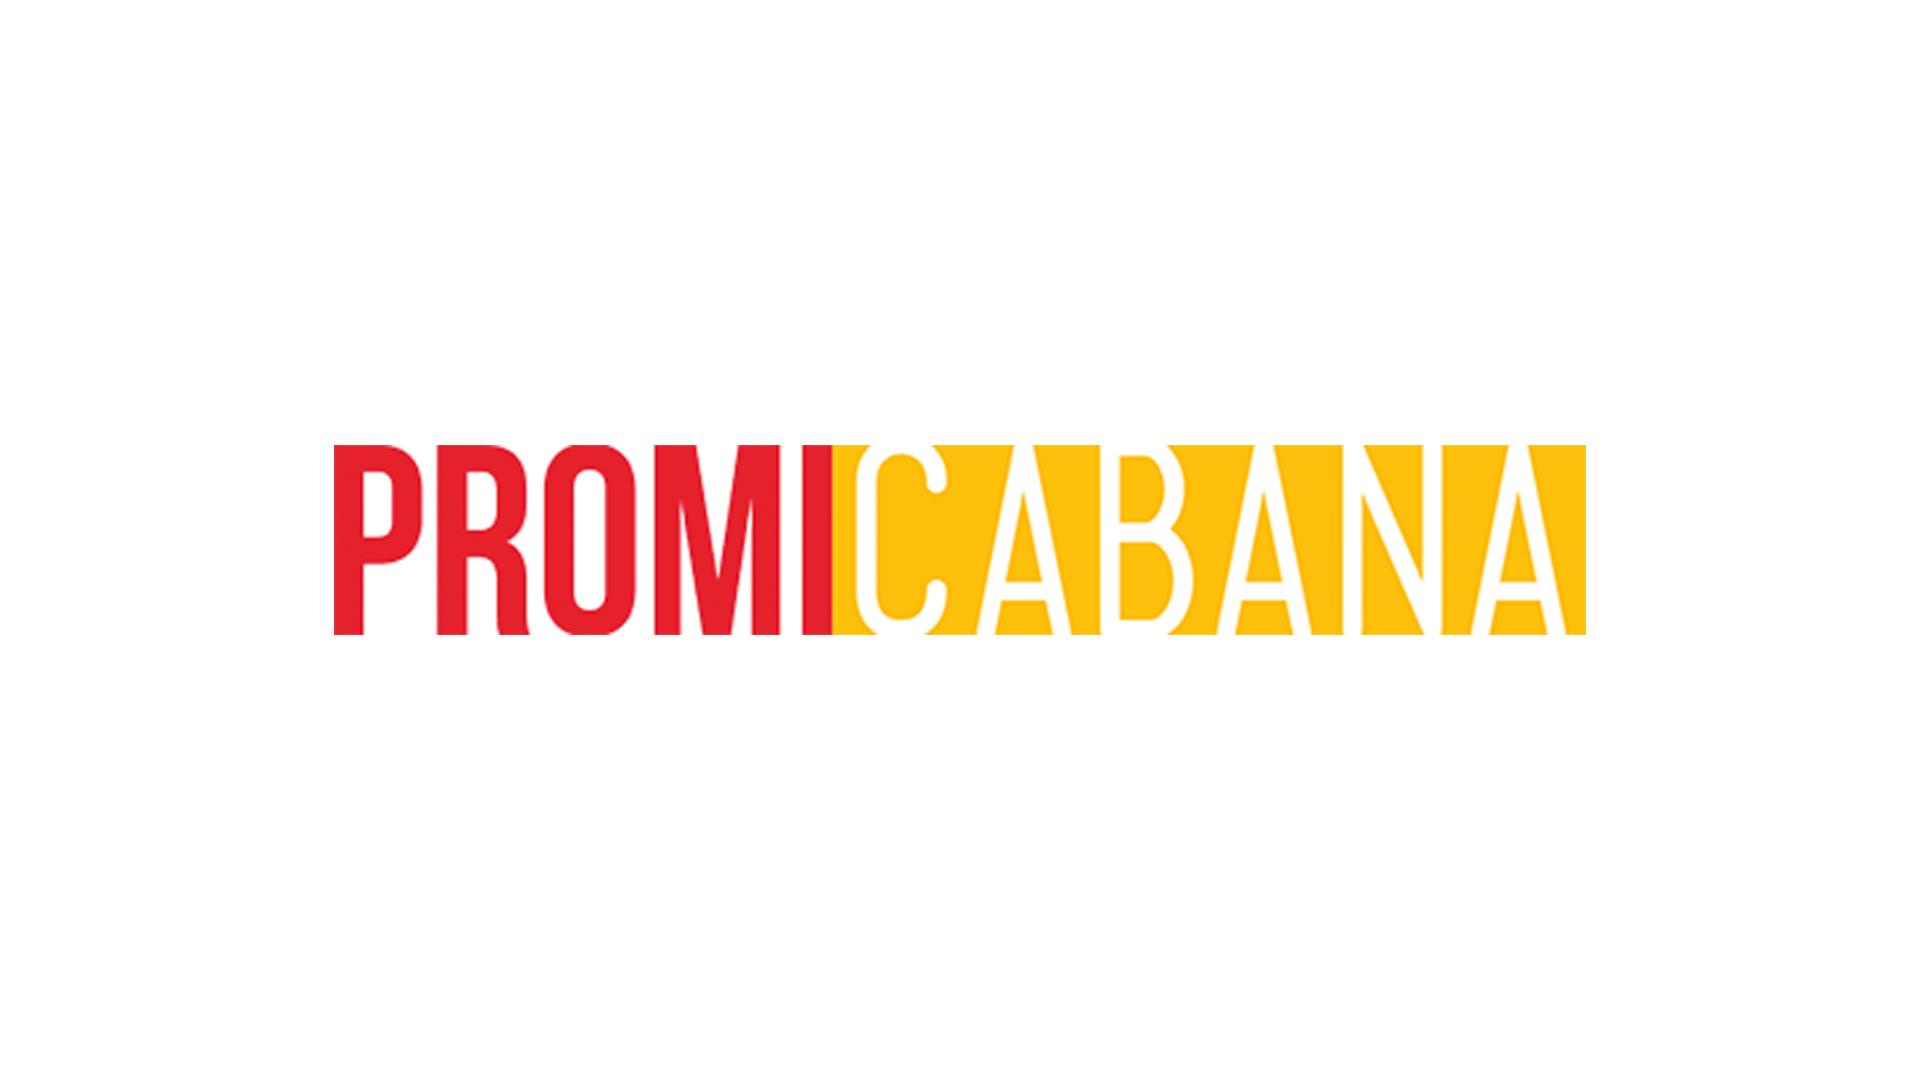 Ed-Sheeran-Red-Nose-Day-Liberia